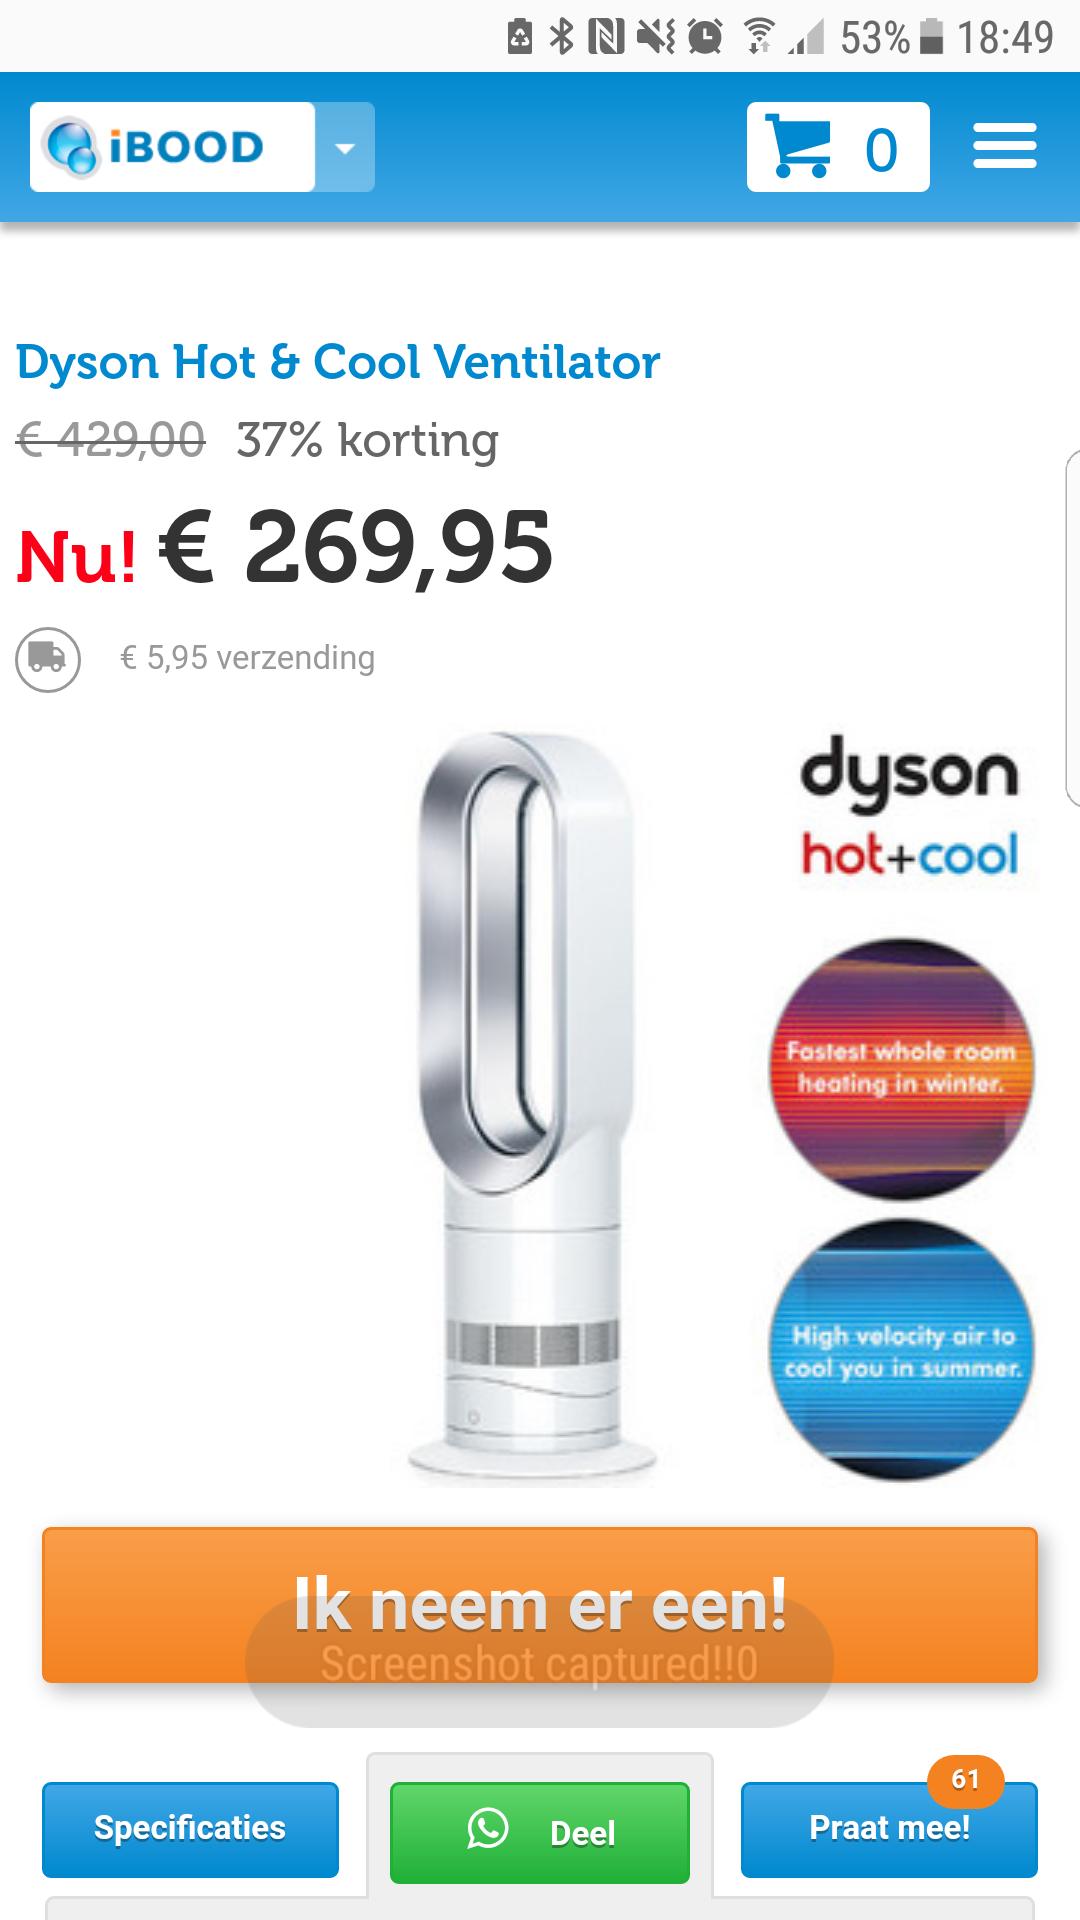 Dyson hot&cool ventilator